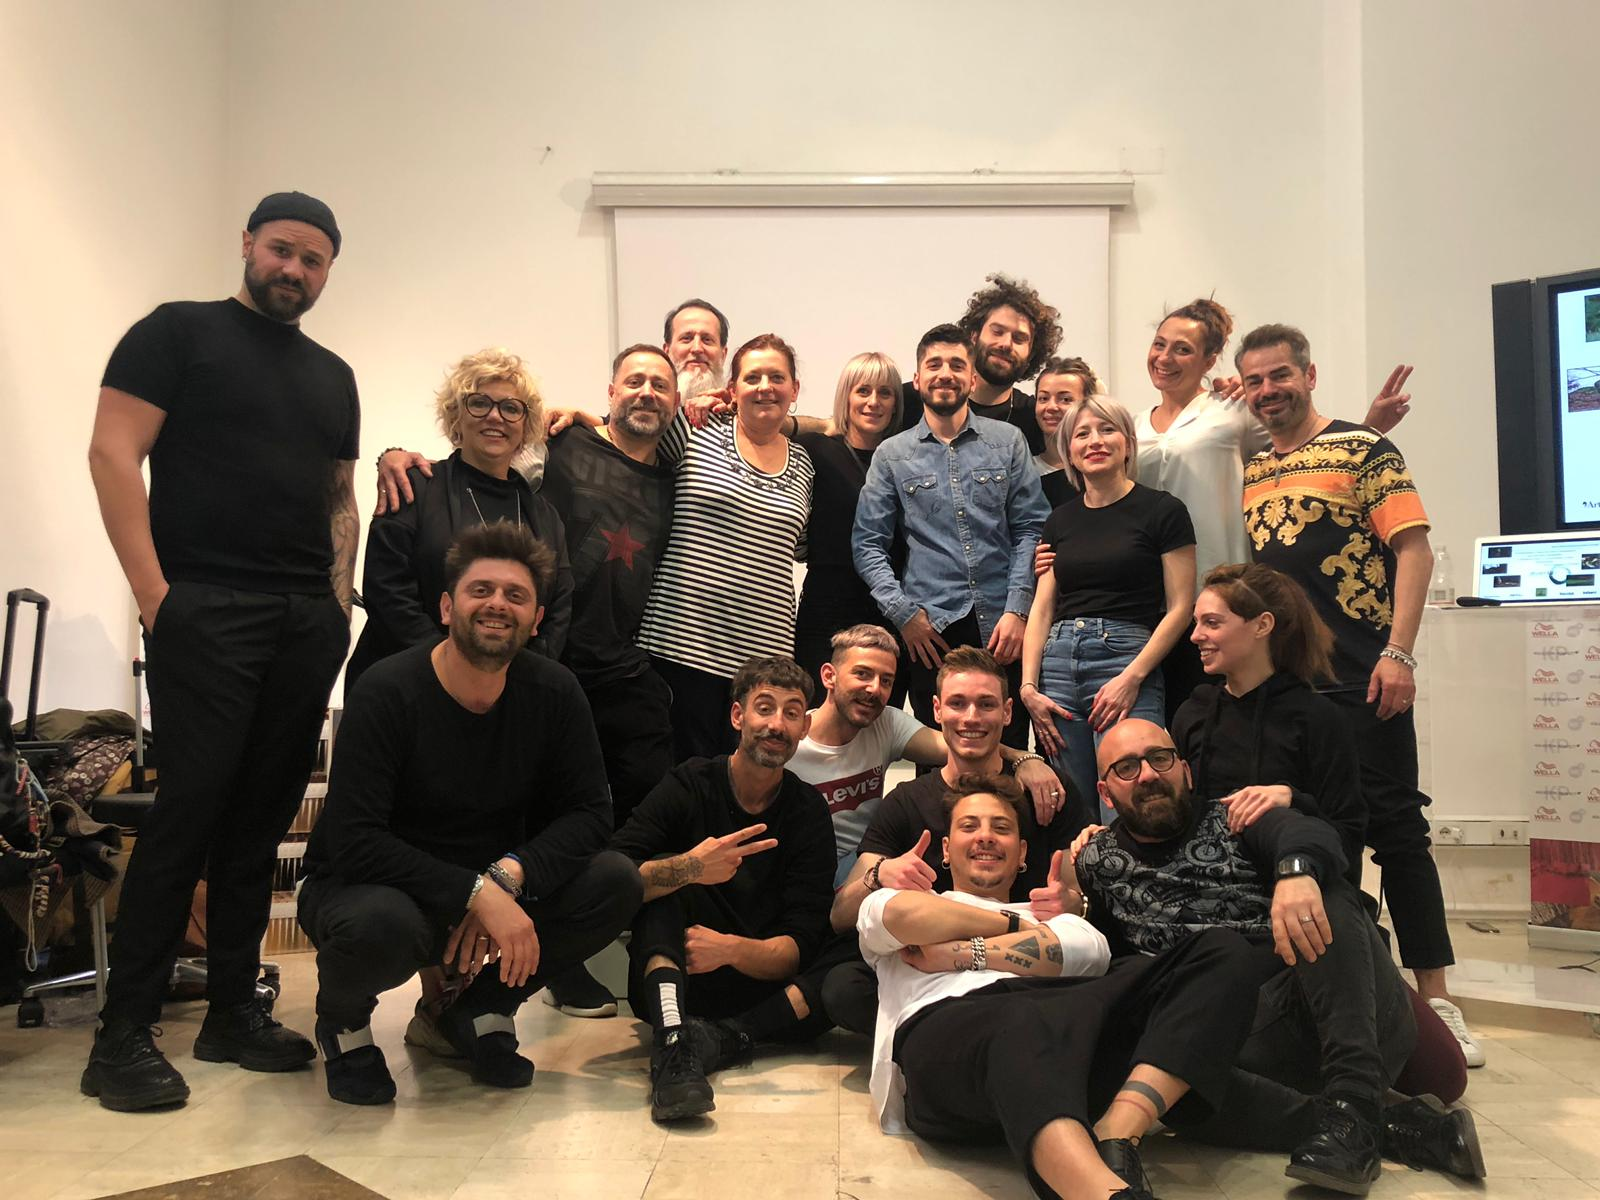 Gruppi stilistici: The Best Club, Art Hair Studios, Mitù, So Glam Coiffeur.